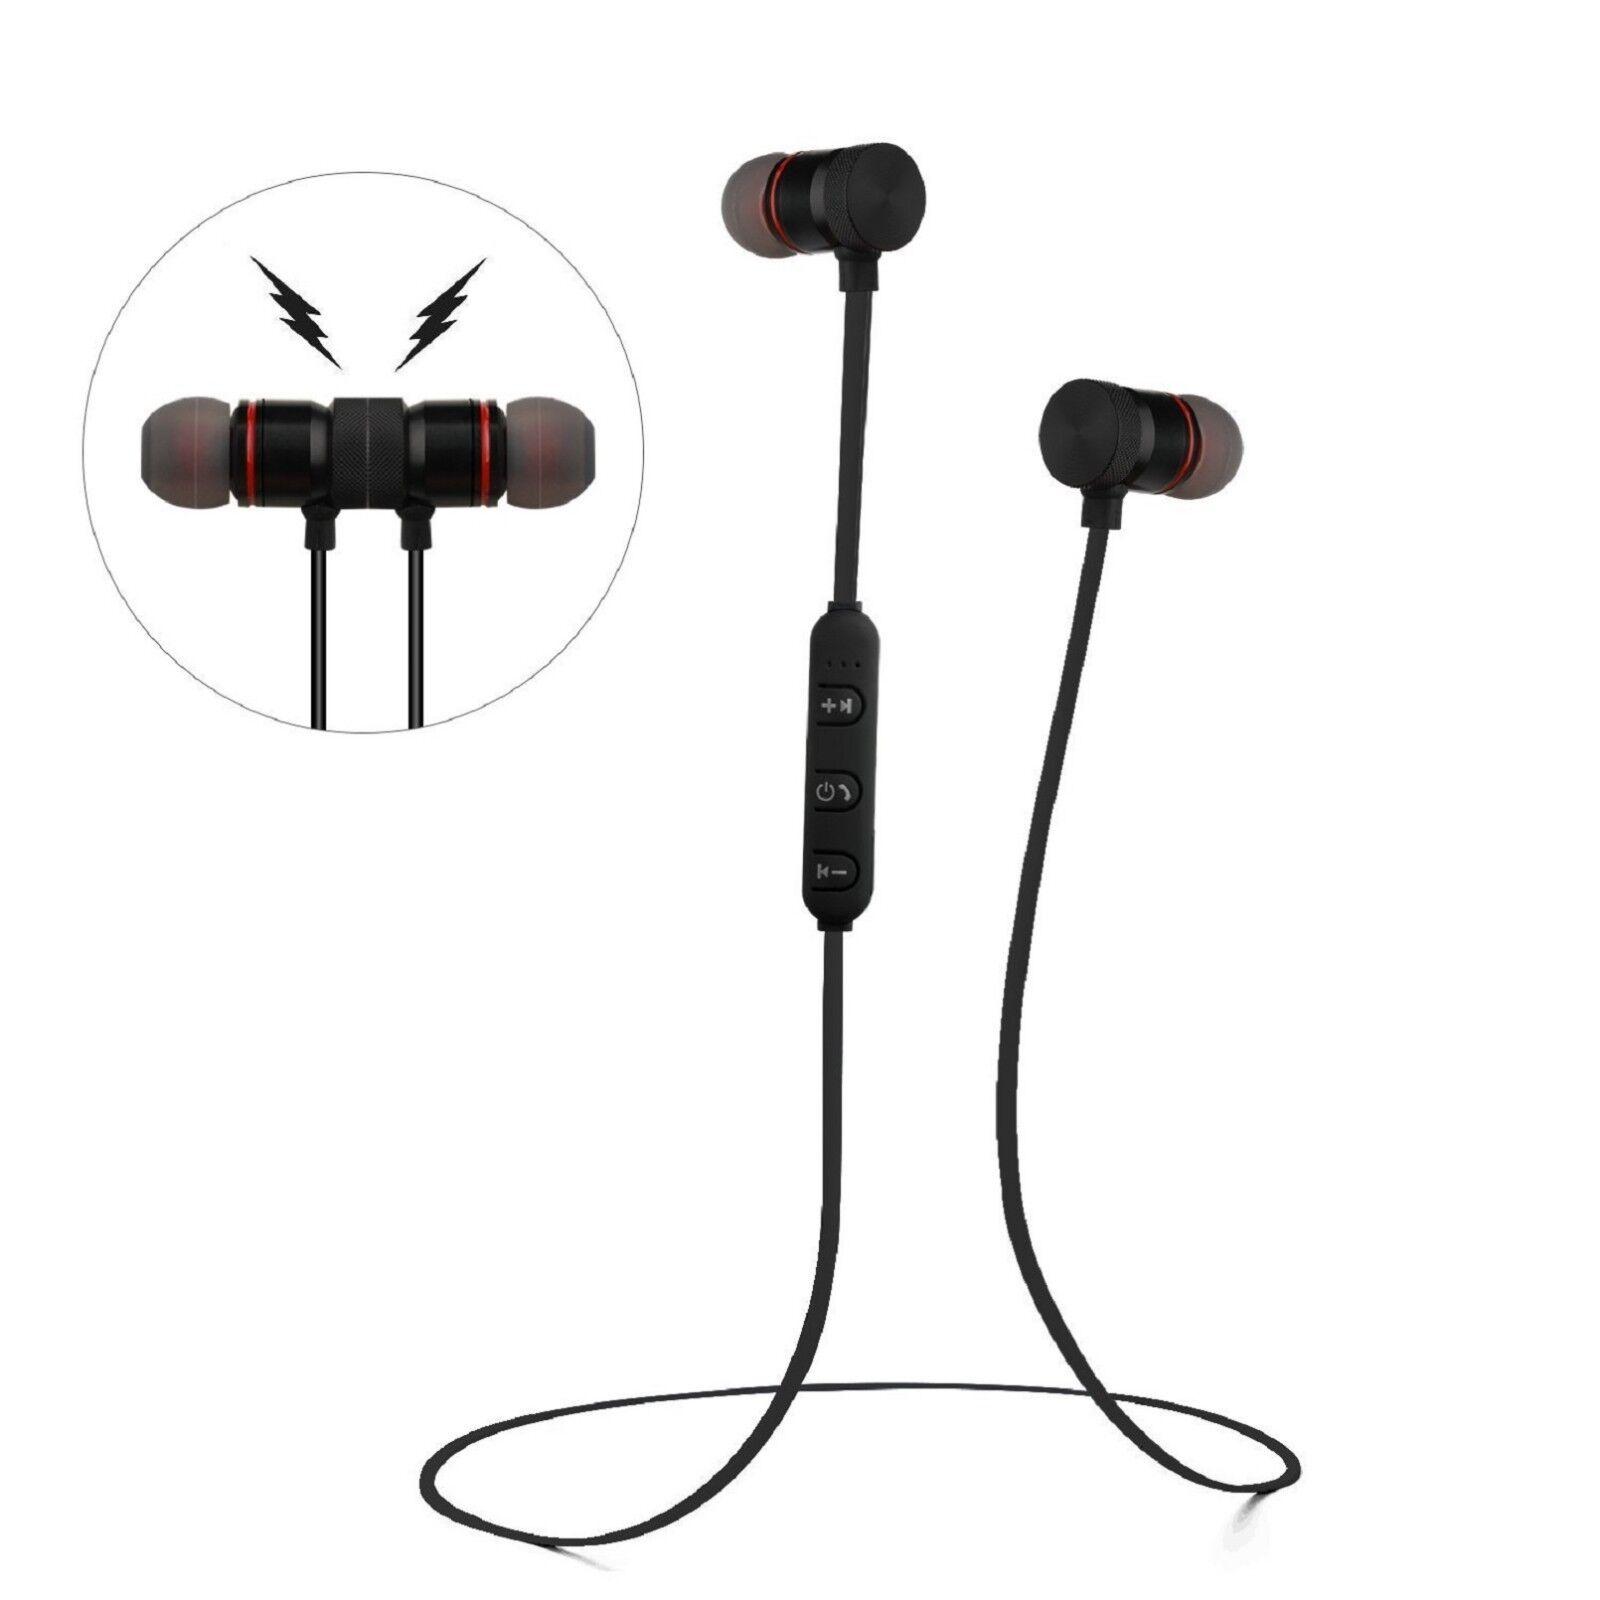 Купить MG Premium 844406 - Wireless Twin Bluetooth Earbuds In-Ear Stereo Earphones Sport Headset Headphones